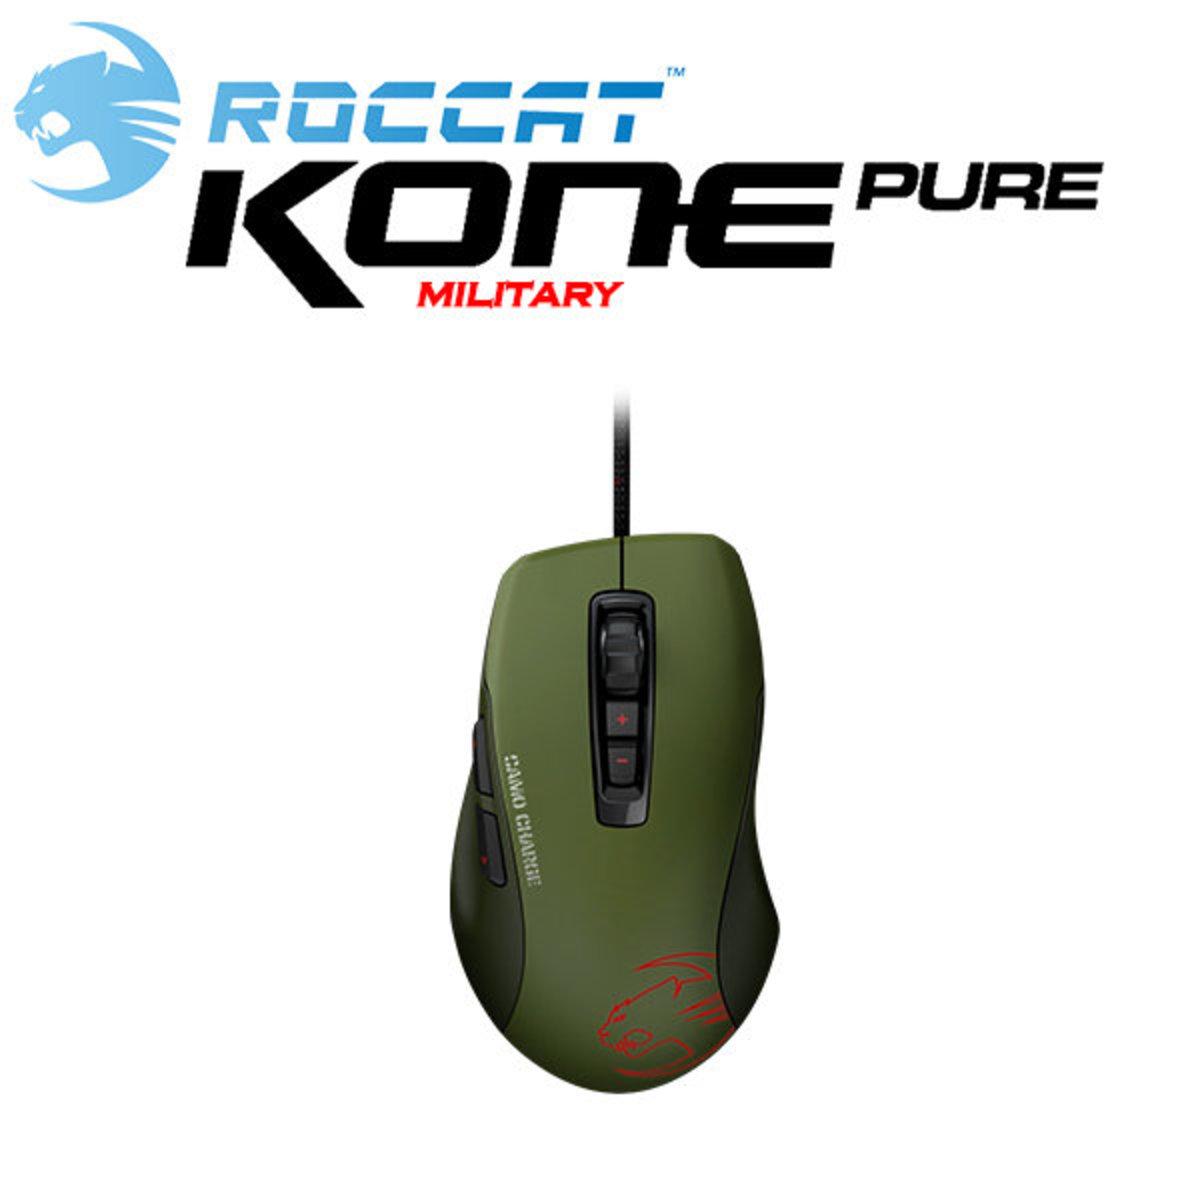 Kone Pure Military 光學滑鼠 - 迷彩衝鋒